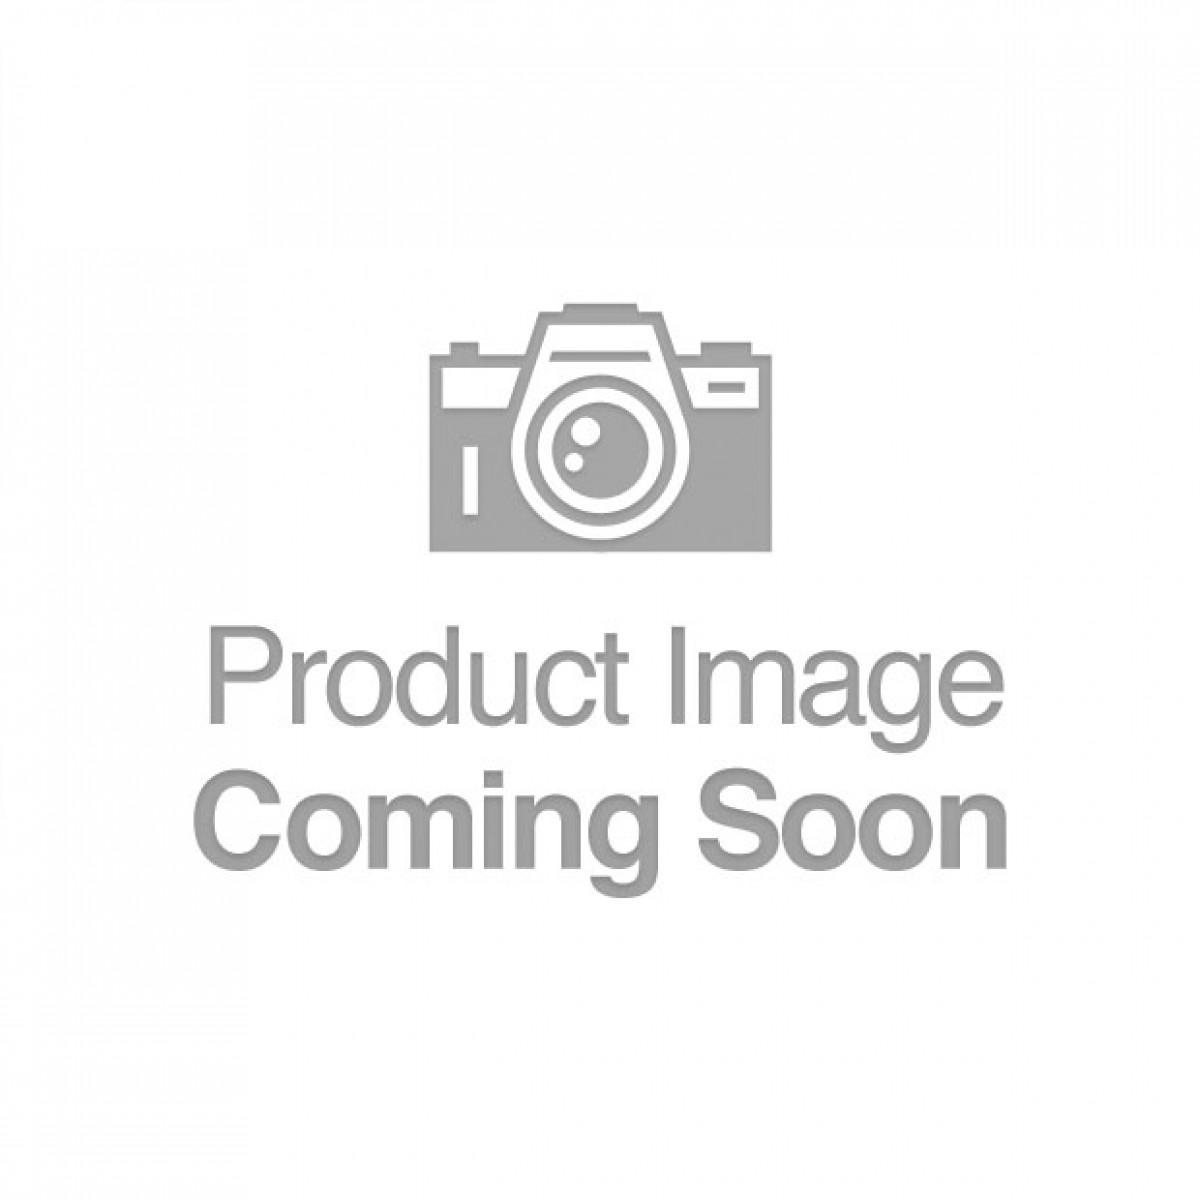 Shots Pumped Elite Beginner Pump w/PSI Gauge - Black